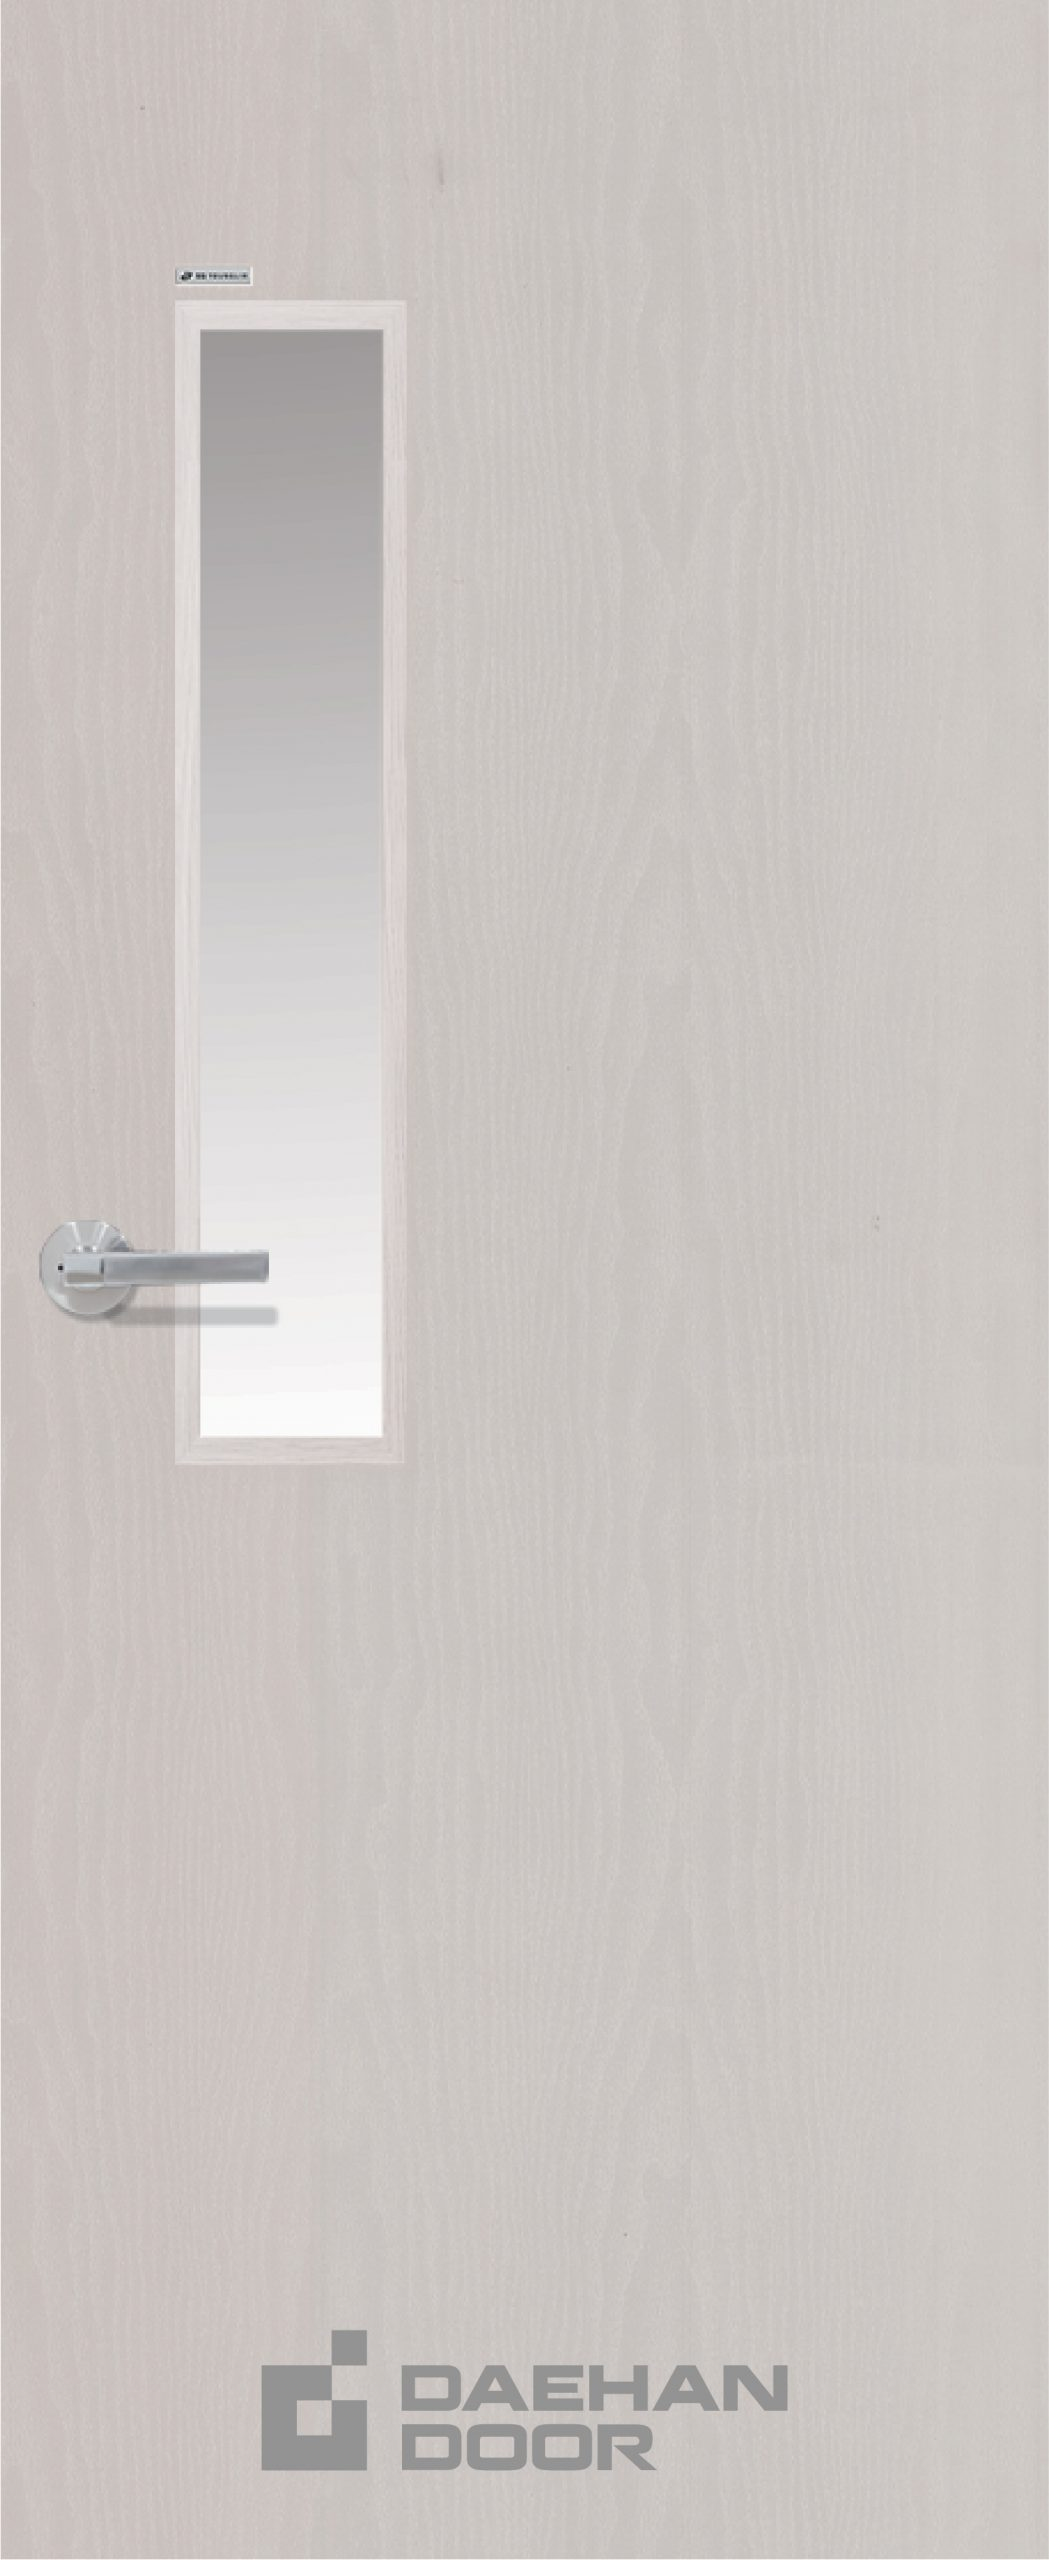 cửa toilet